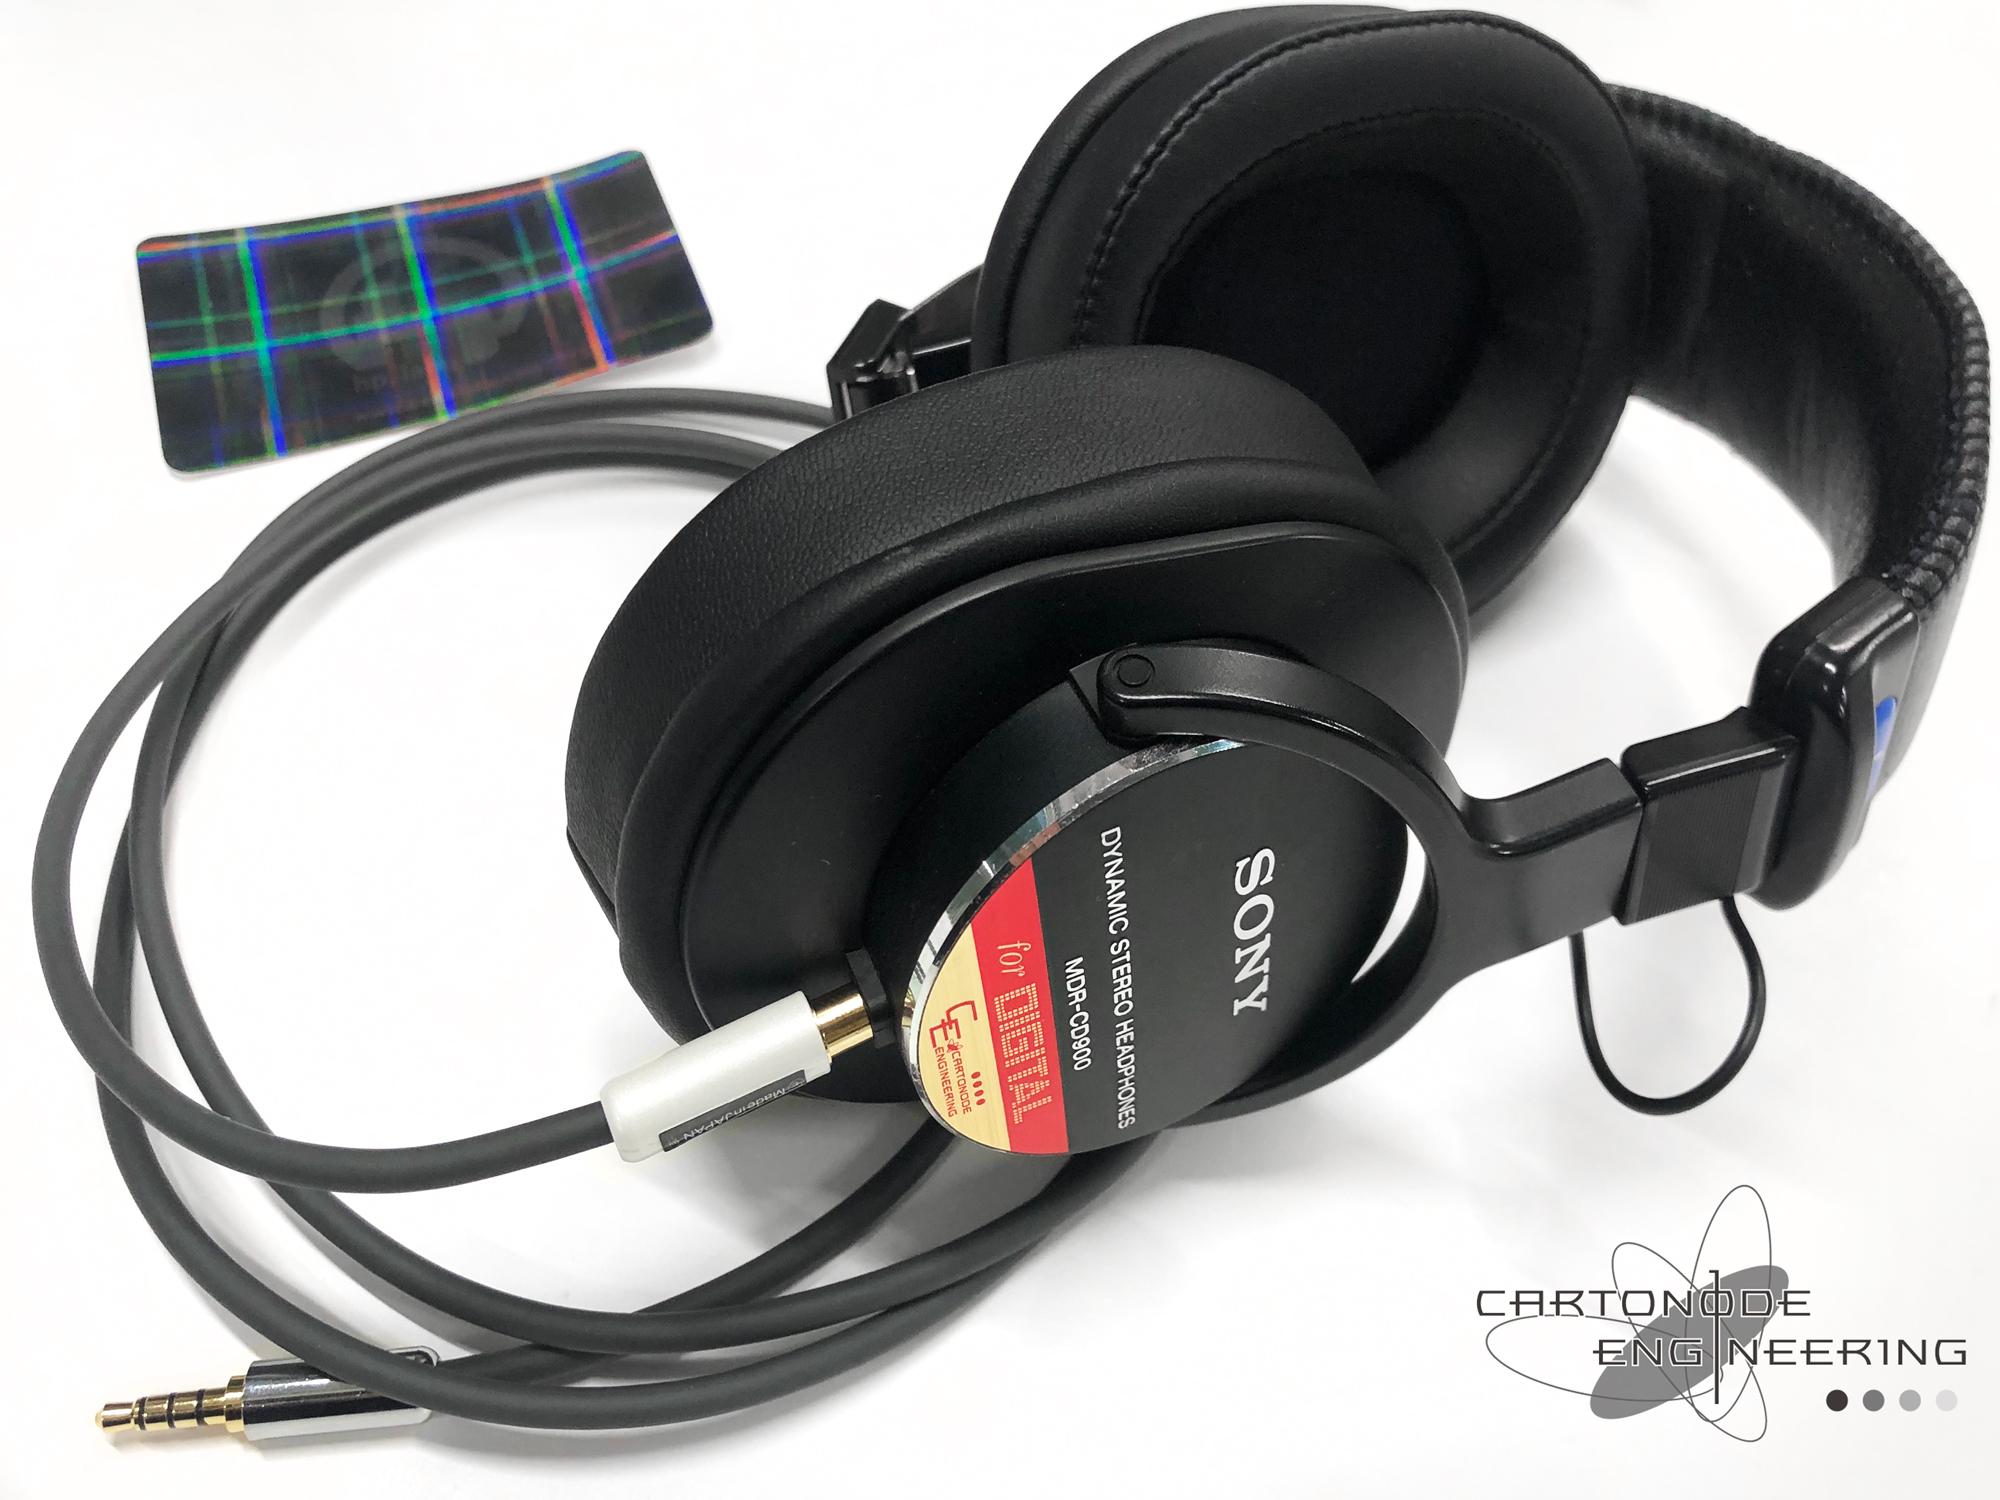 MDR-CD900 バランス脱着3.5